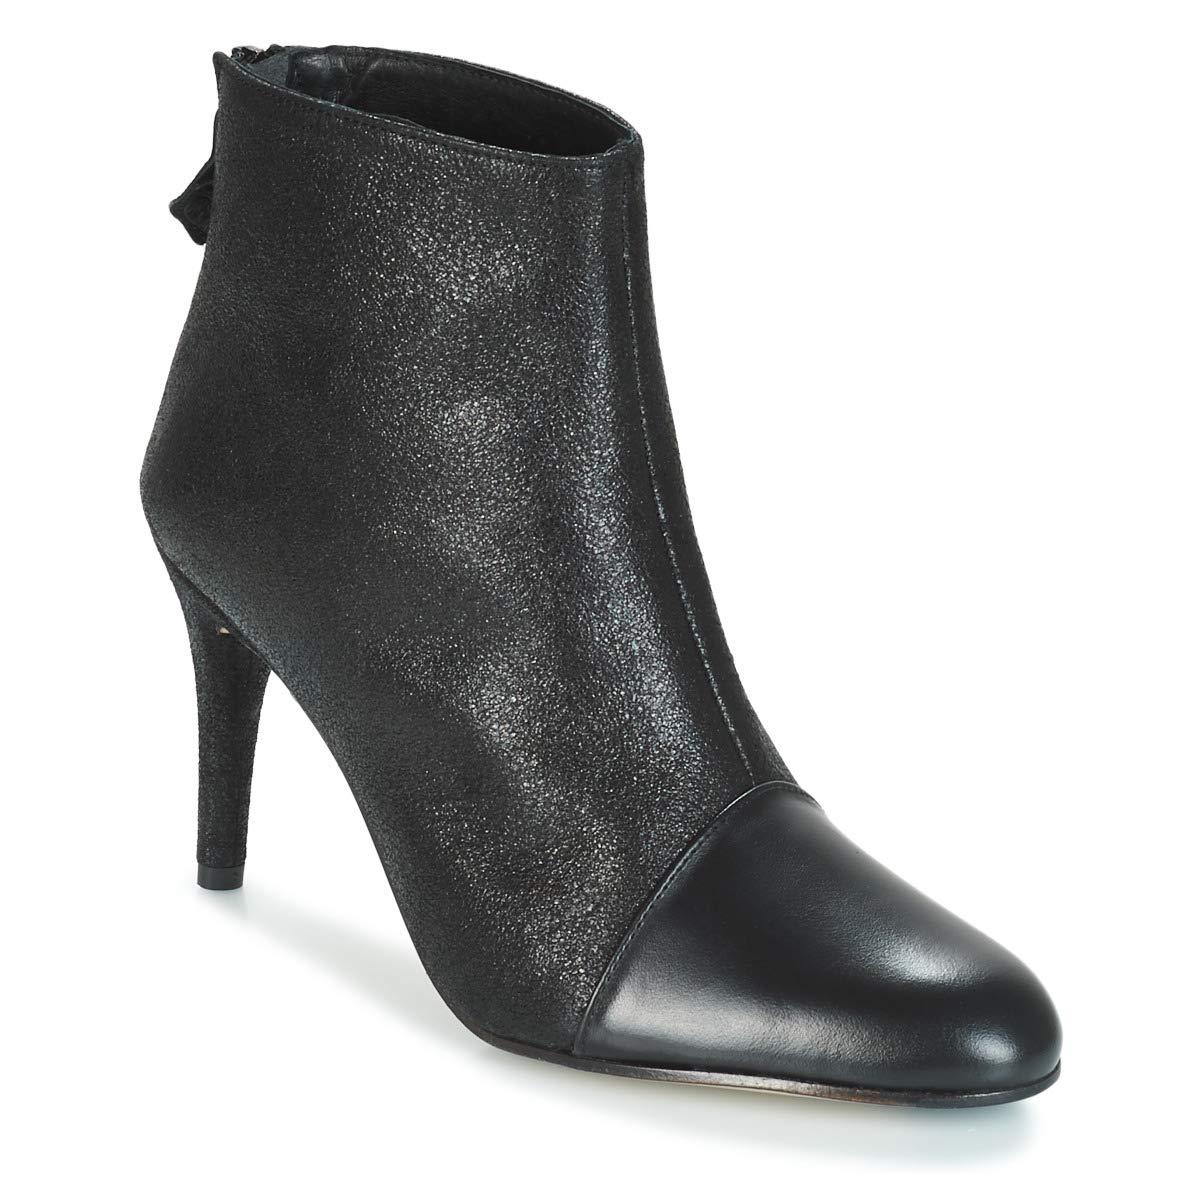 ELIZABETH STUART CITOU Stiefelletten Stiefel Damen Schwarz Low Stiefel